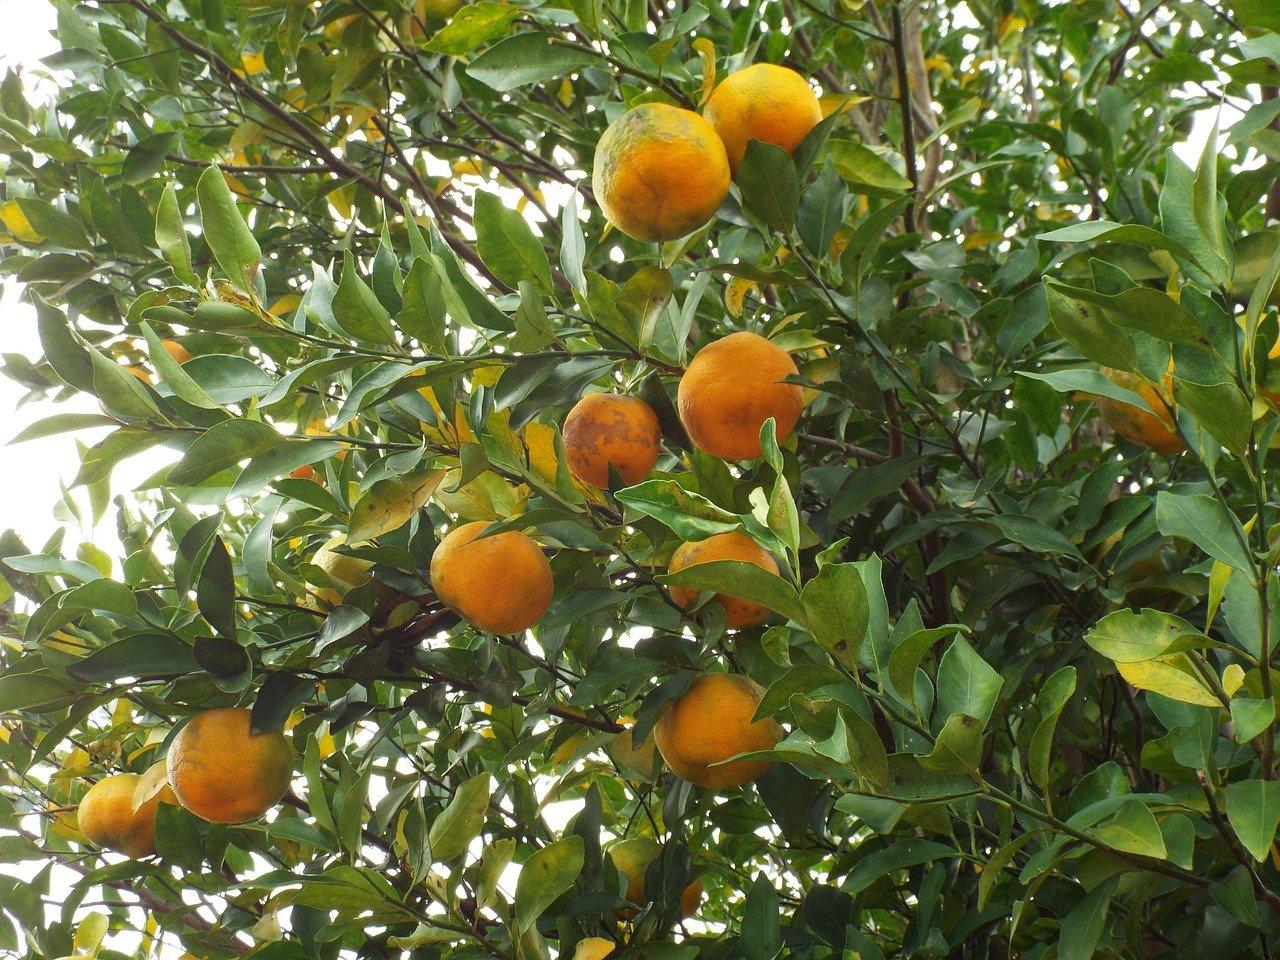 fruit-355096_1280